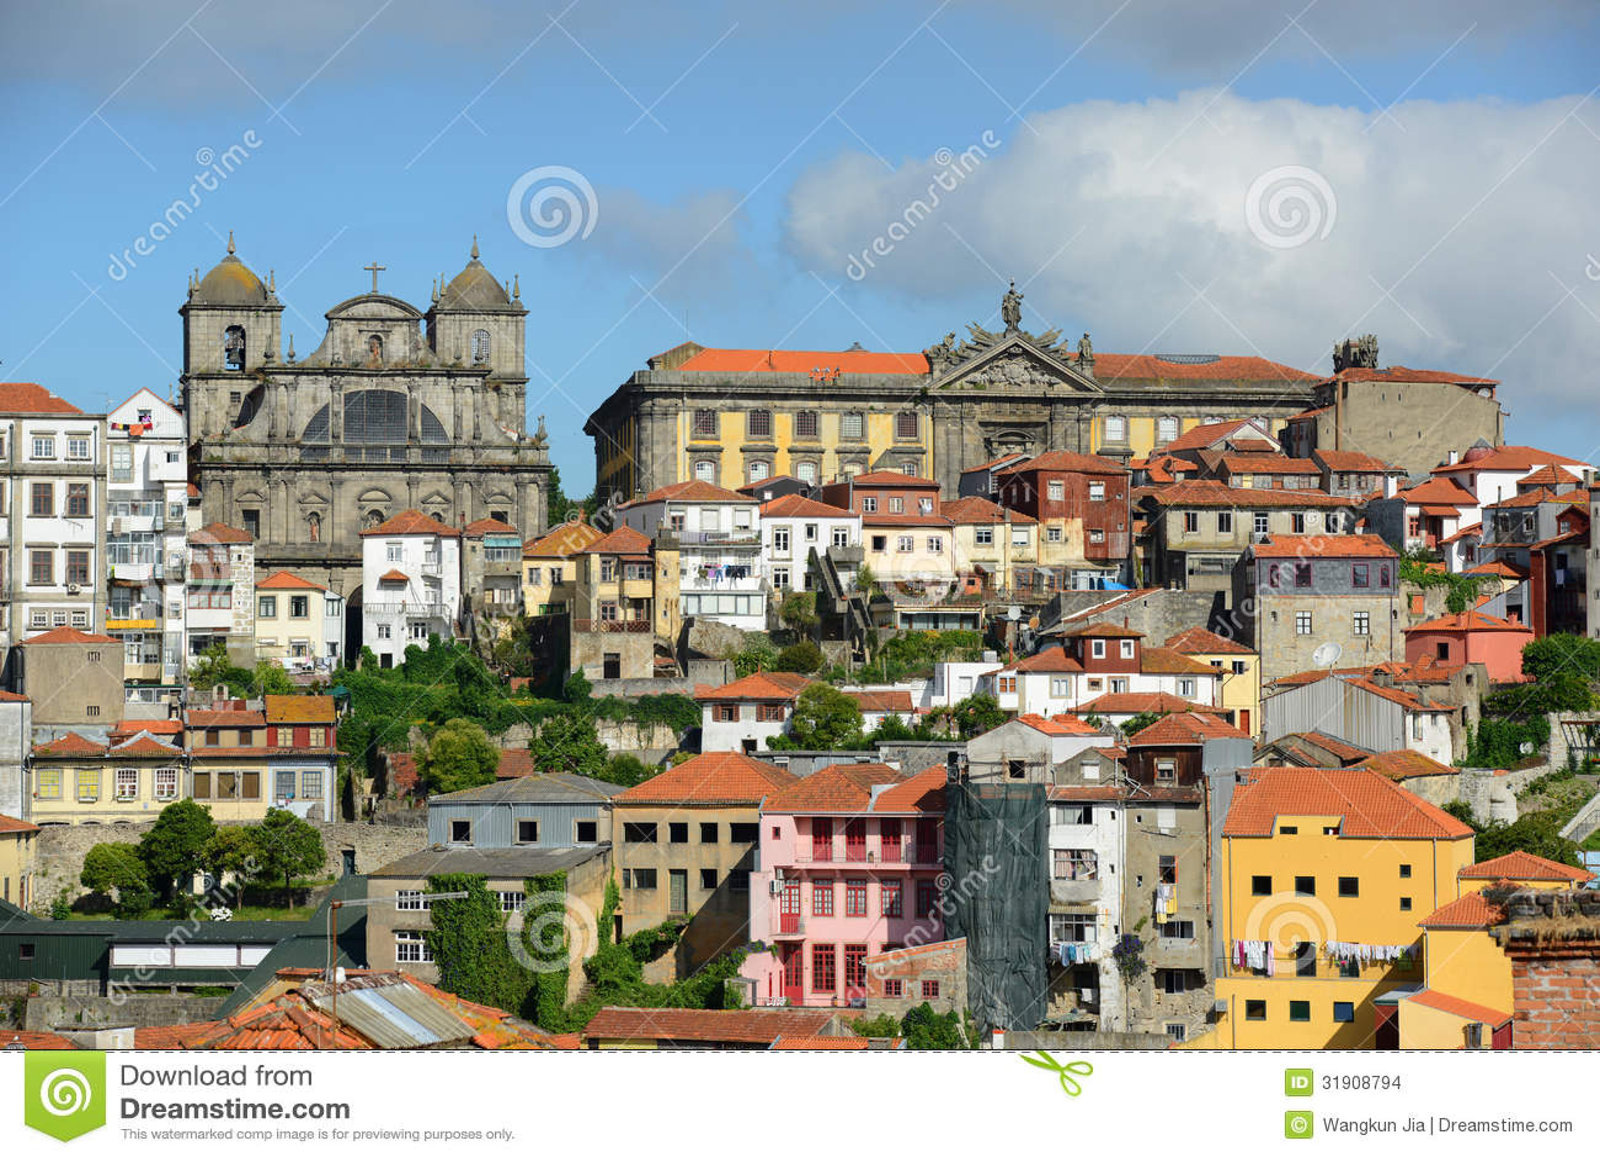 alte stadt porto portugal stockbilder bild 31908794. Black Bedroom Furniture Sets. Home Design Ideas